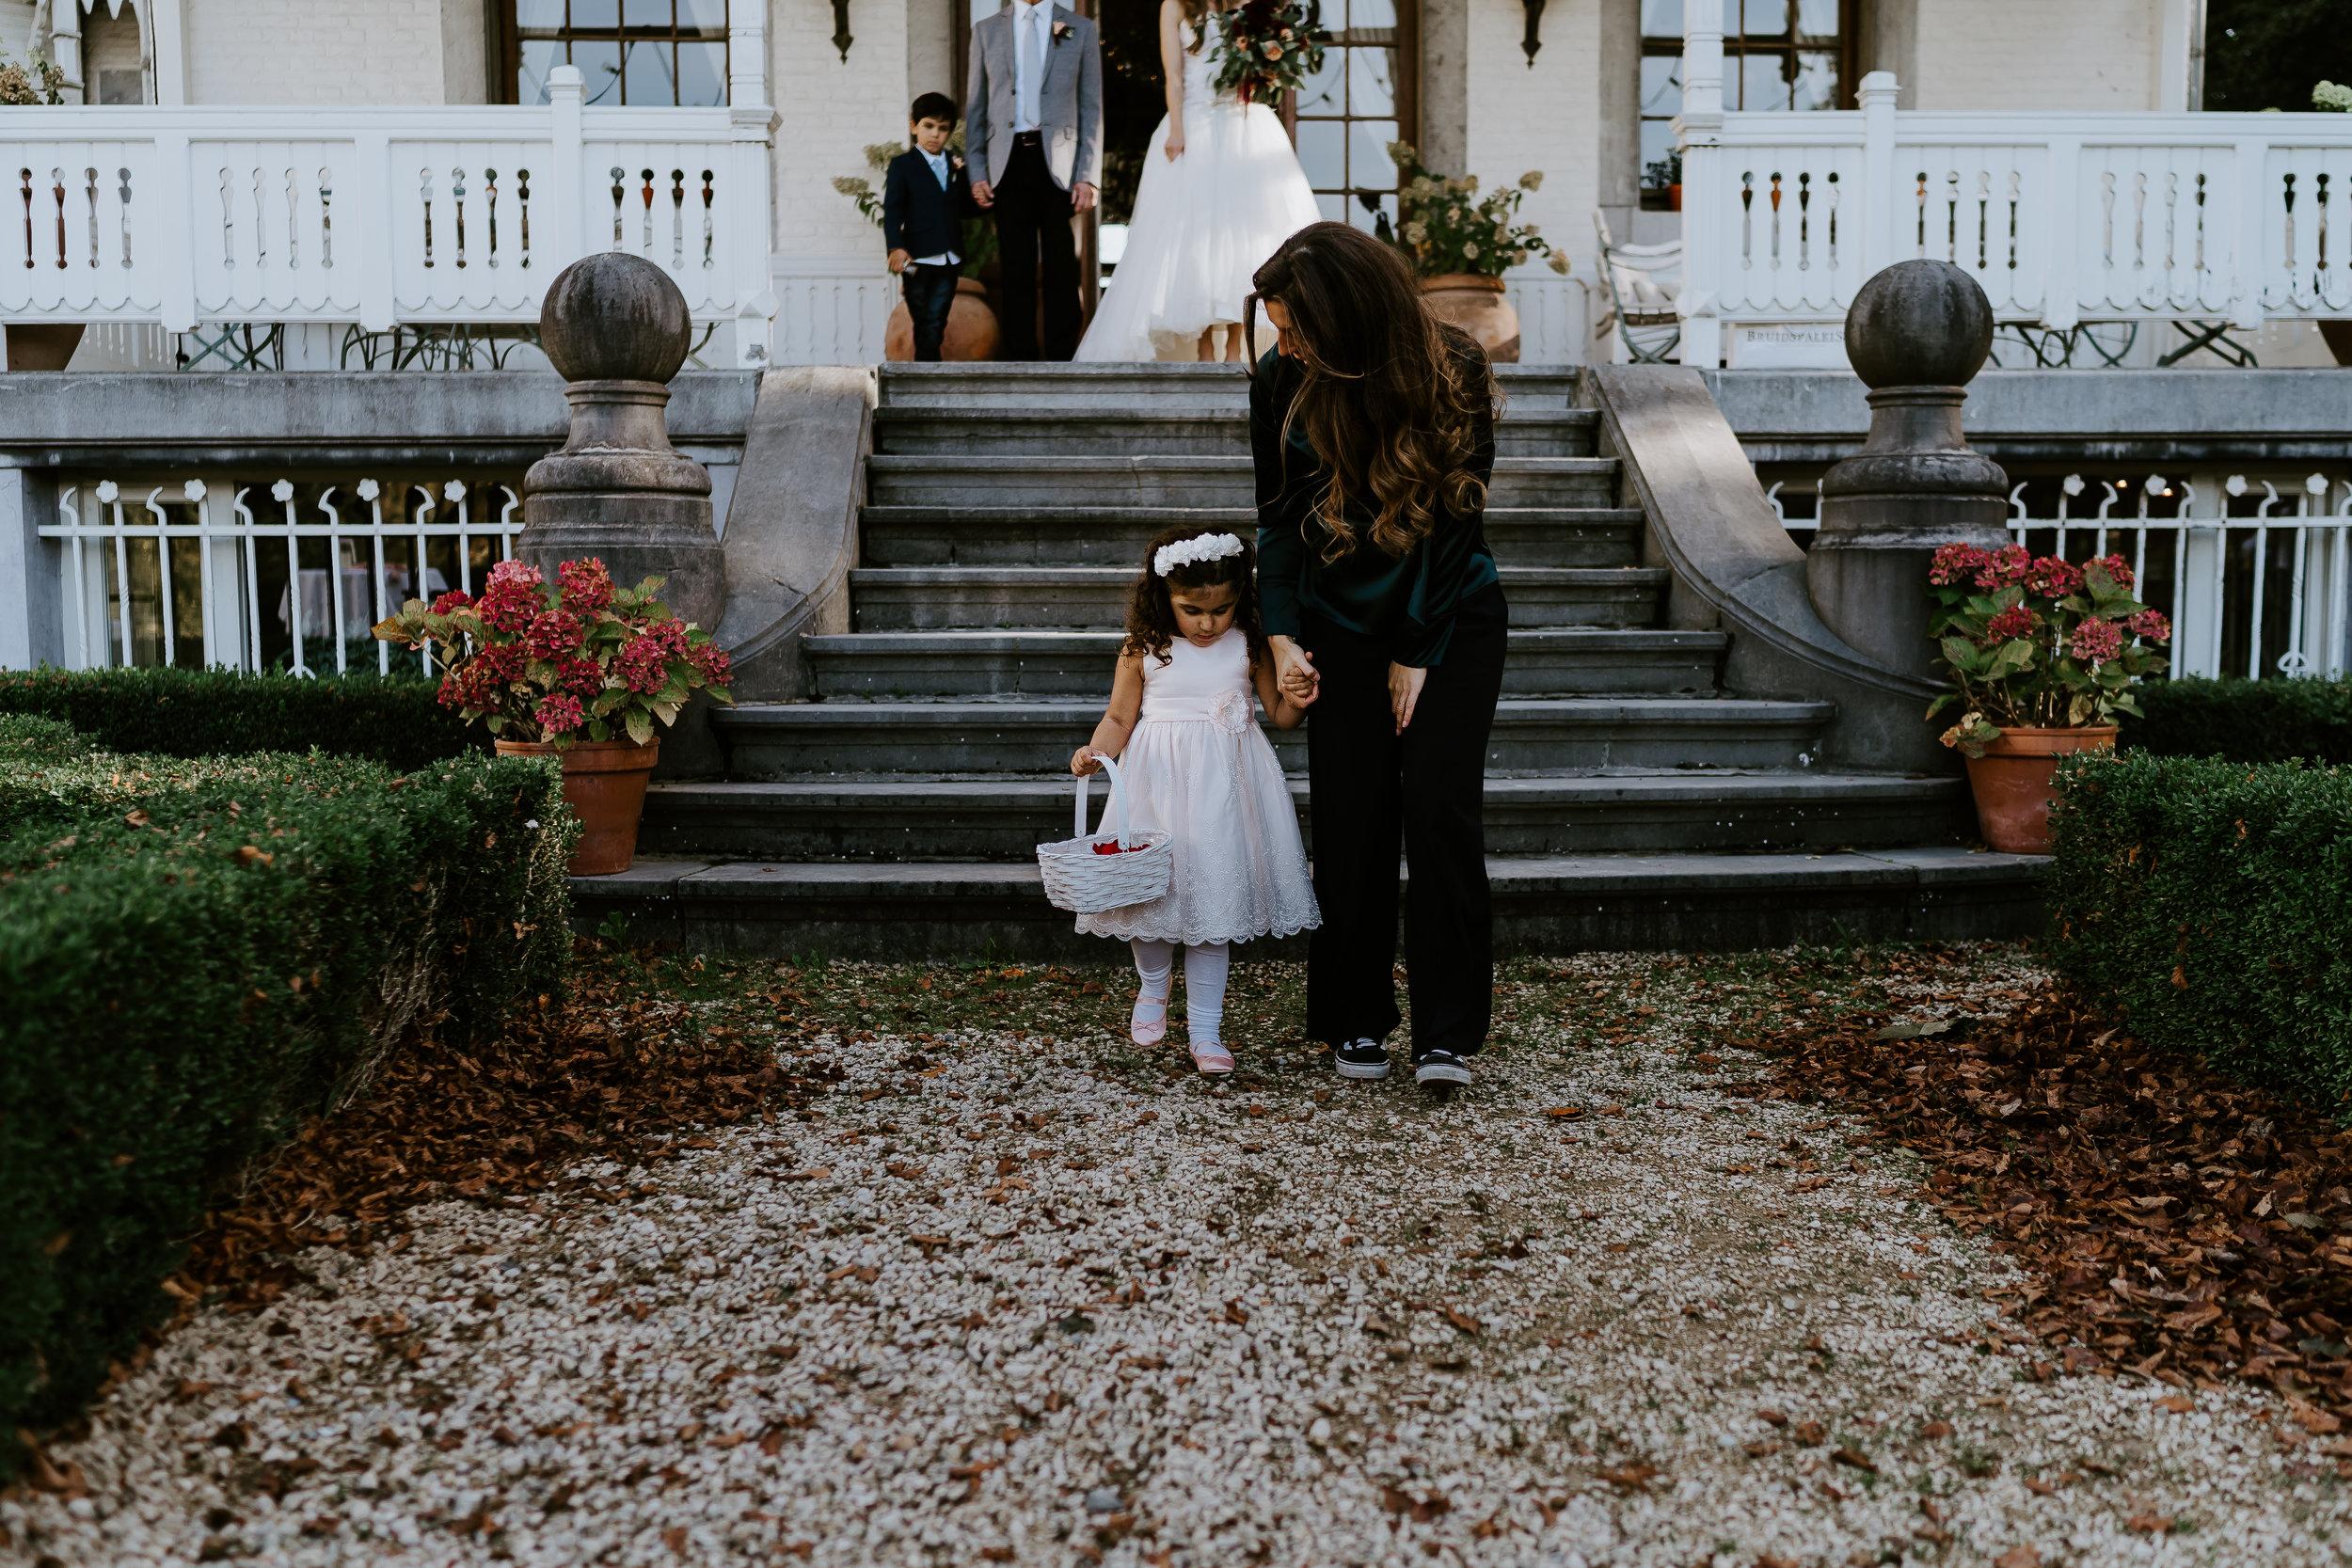 bruiloft-altembrouck-overthemoonweddings32.jpg